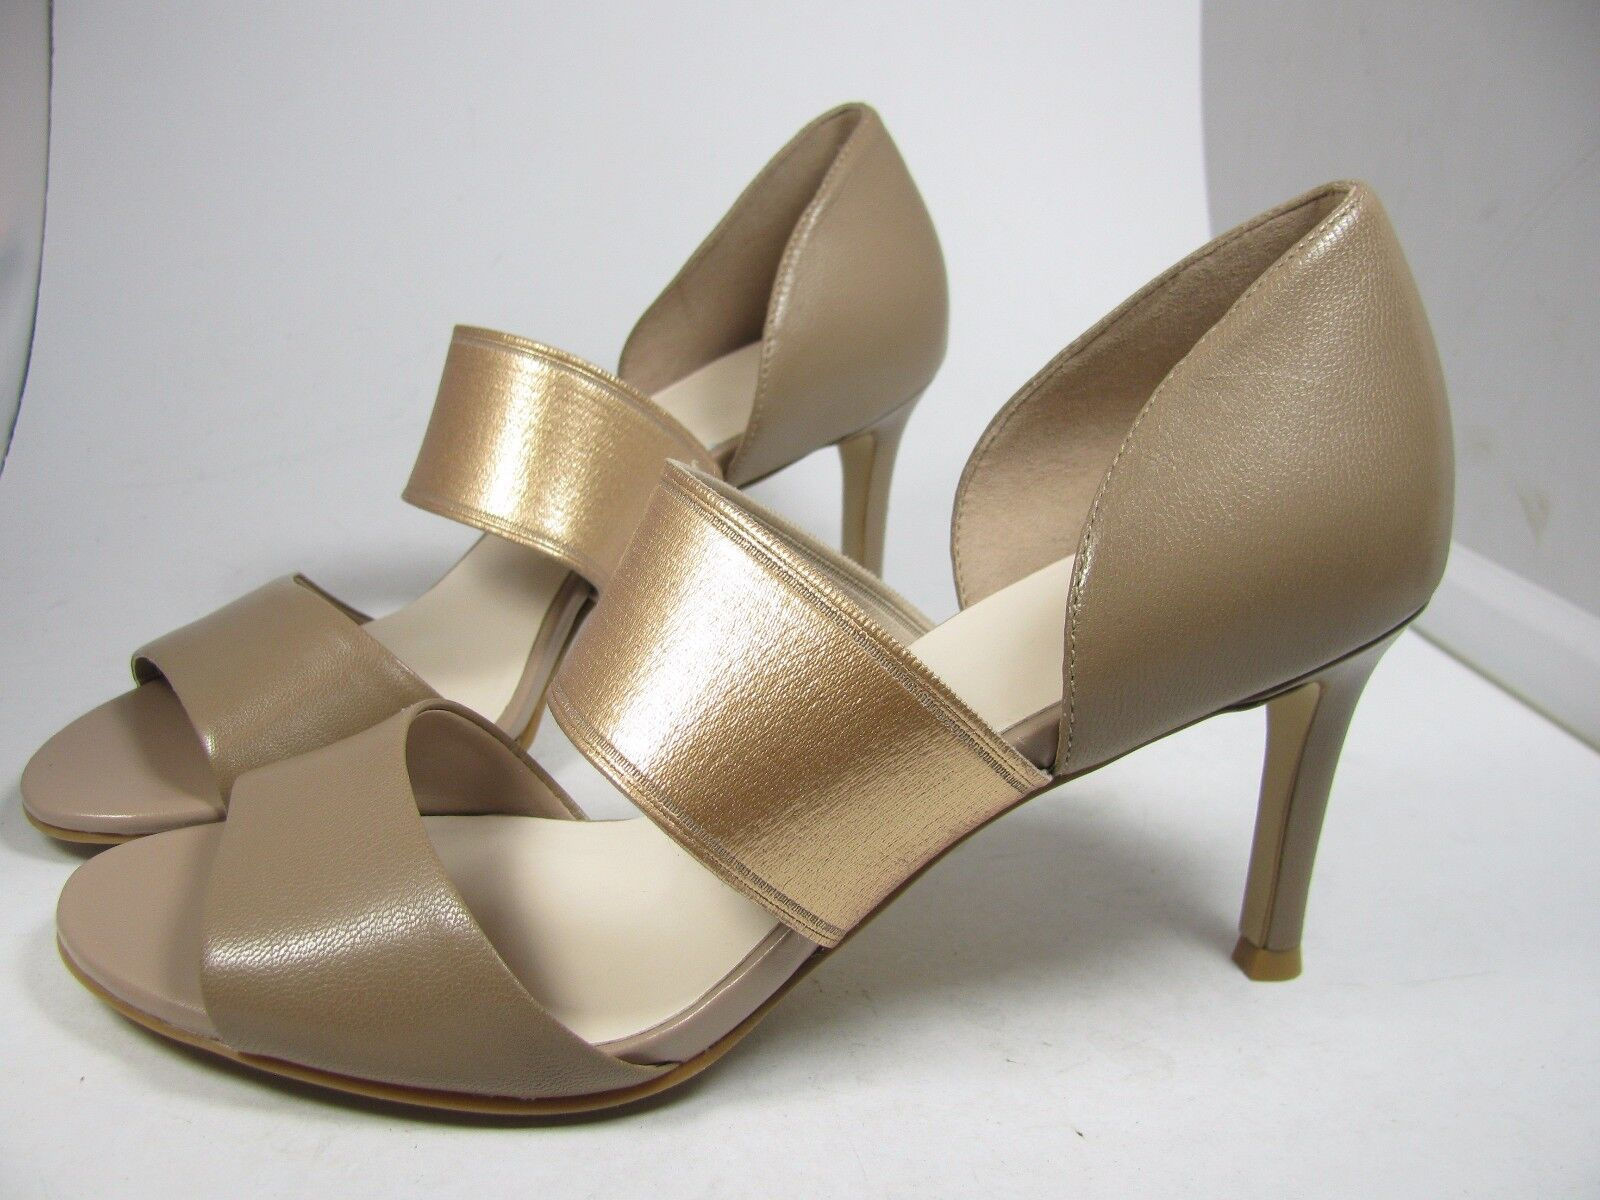 SZ 7.5 NEW NEW NEW COLE HAAN sandals heels damen Belline tan Pump open toe schuhe 3e9f3c